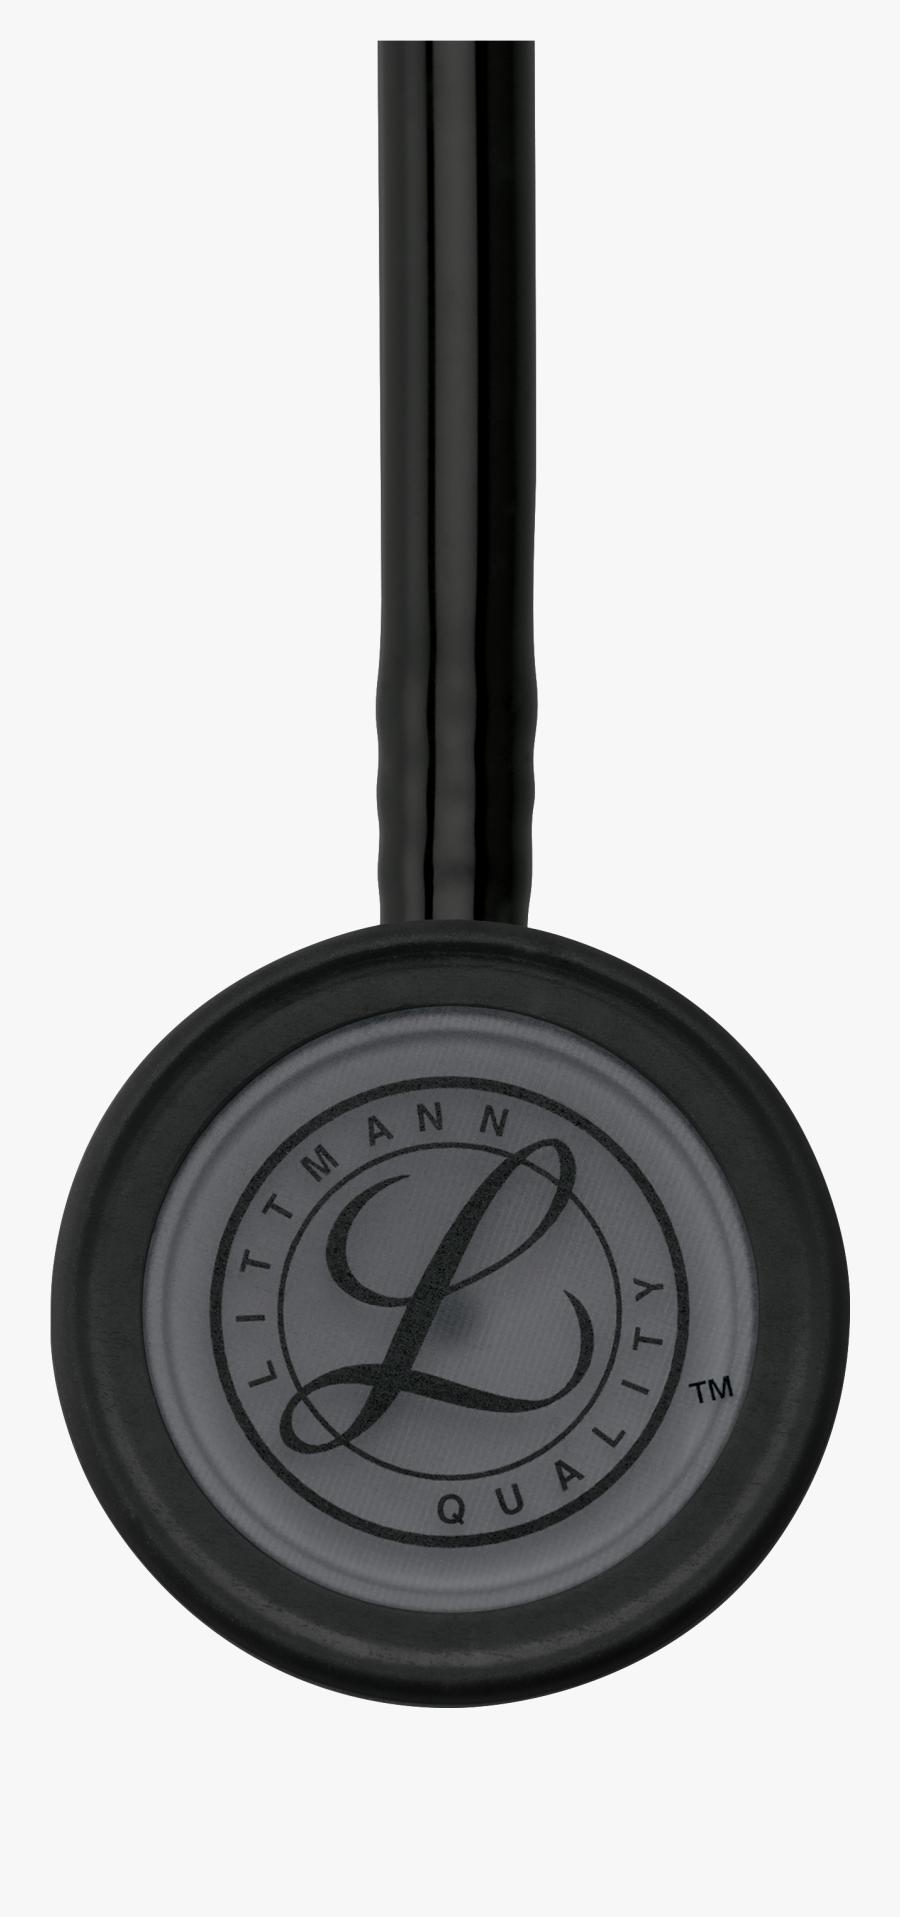 Littmann Classic Iii Monitoring Stethoscope - Littmann Black Edition Black Chestpiece, Transparent Clipart